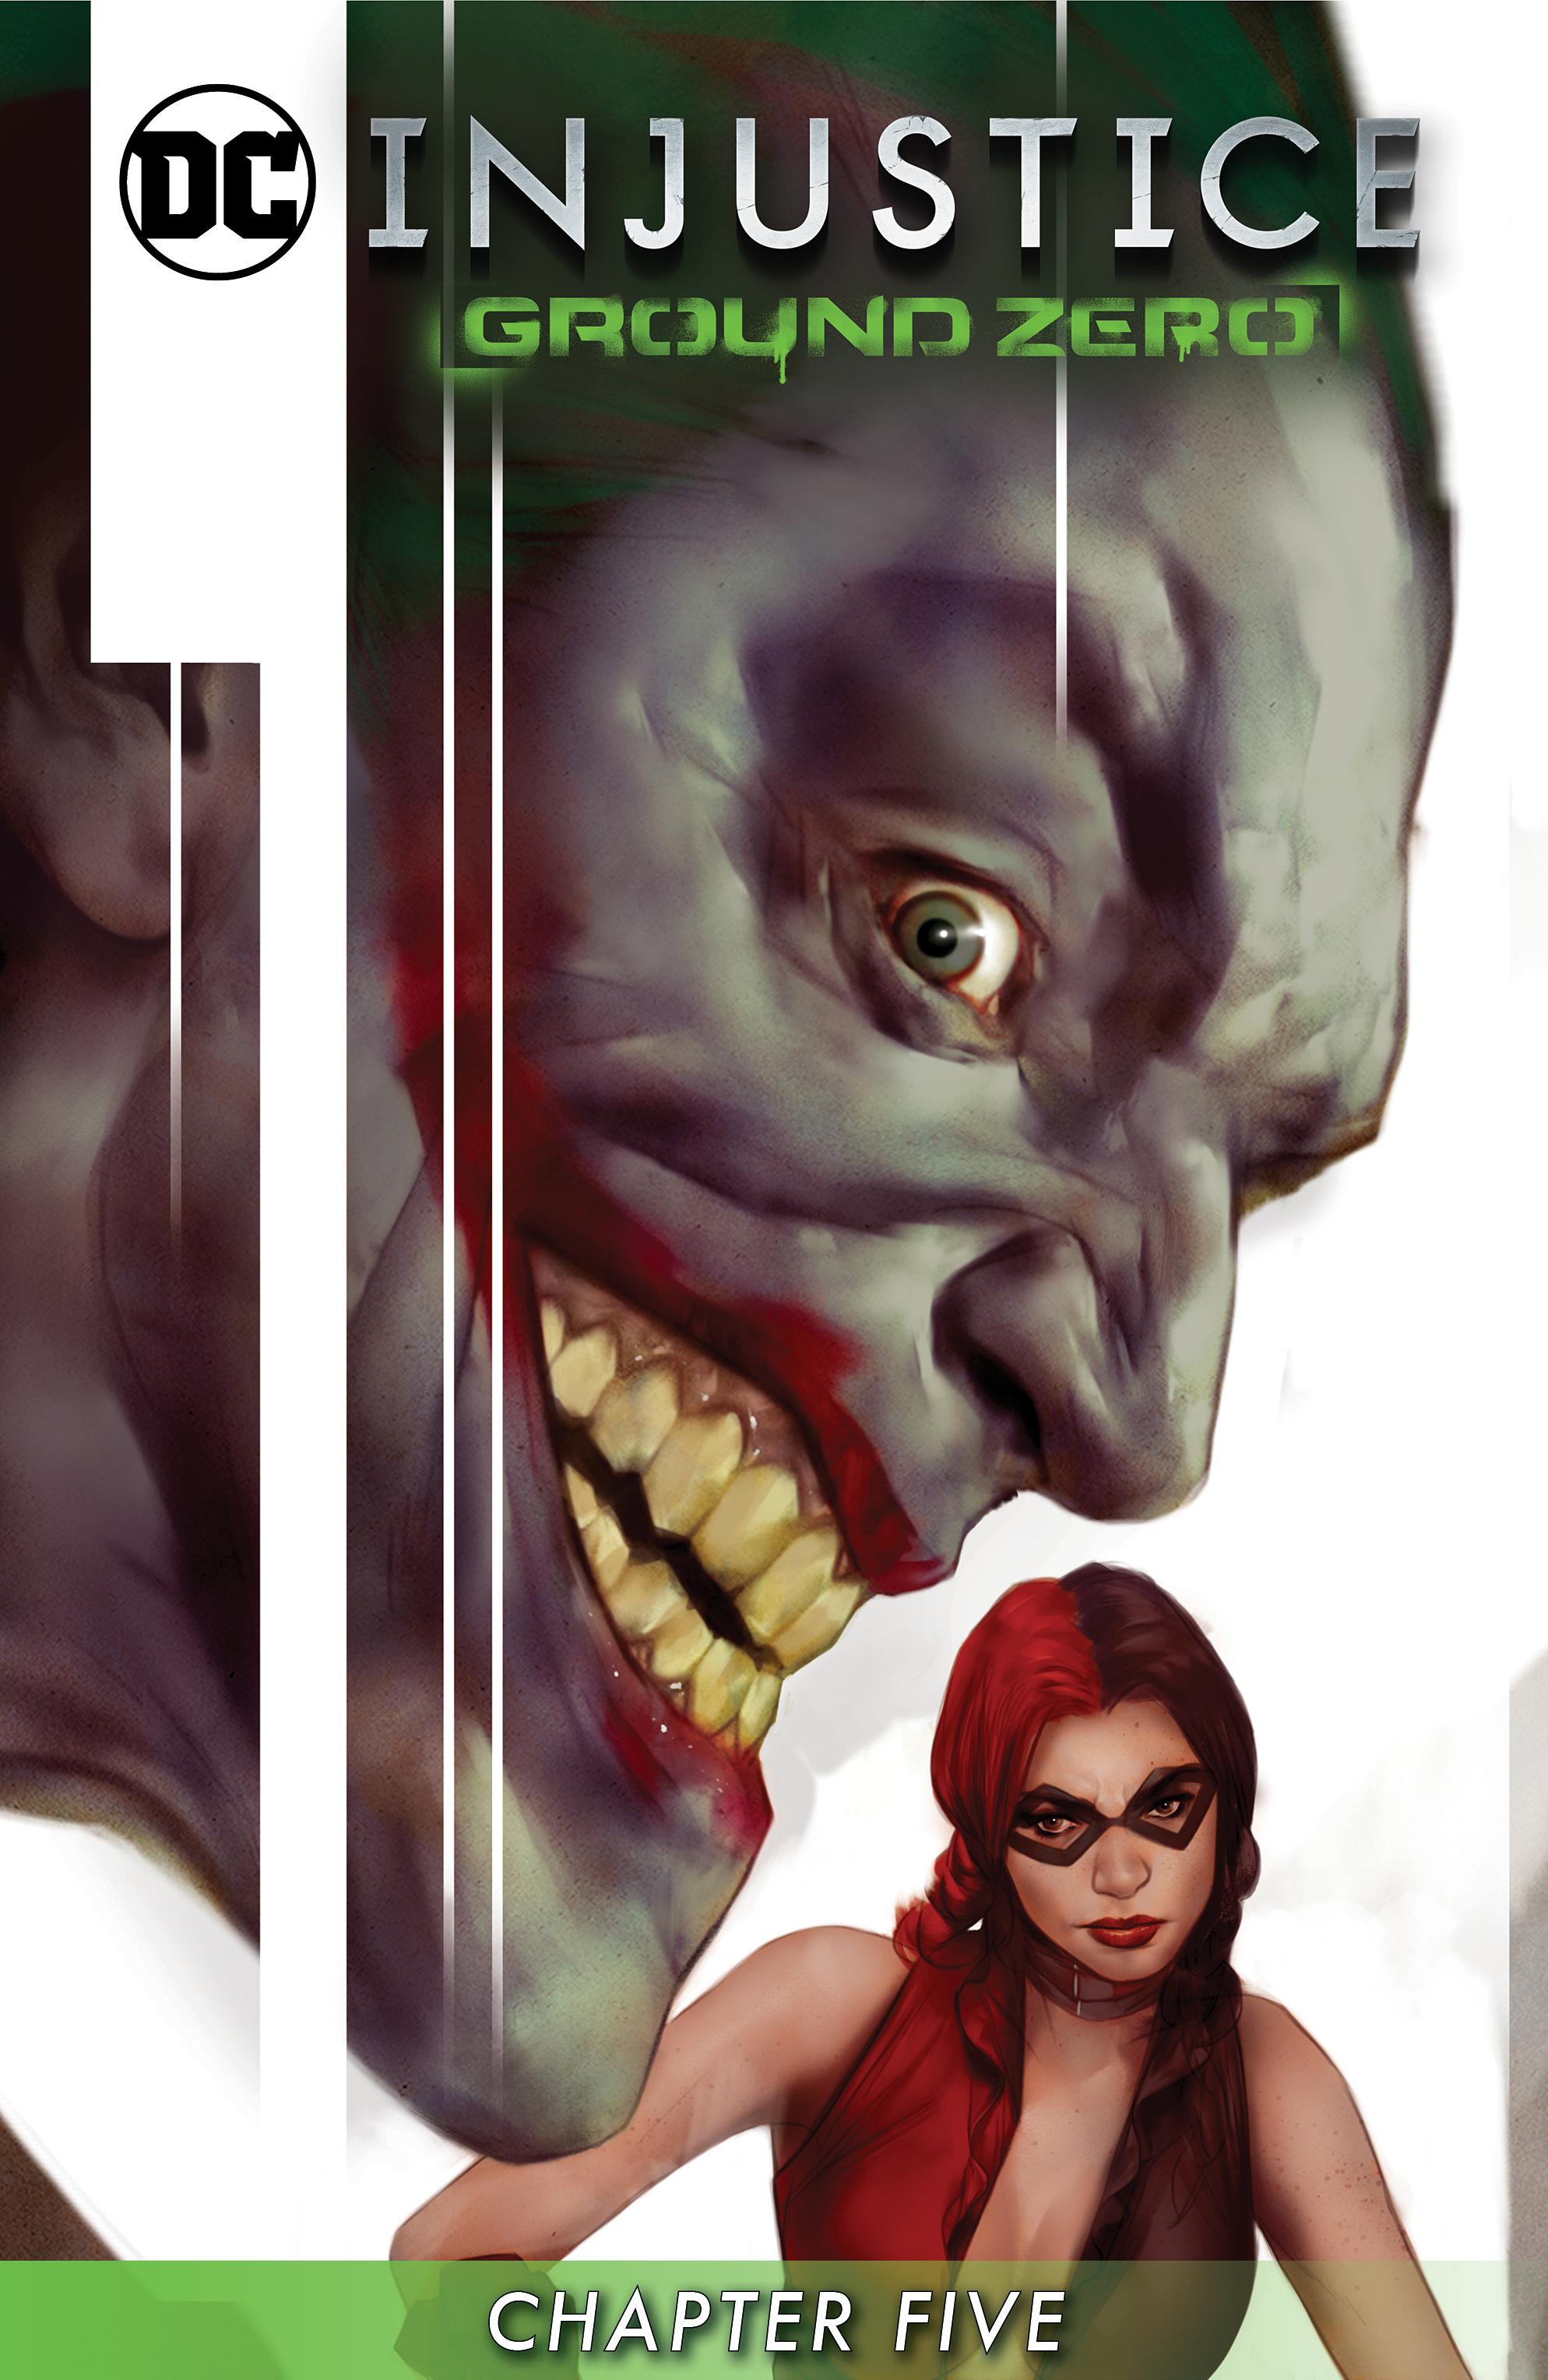 Read online Injustice: Ground Zero comic -  Issue #5 - 2